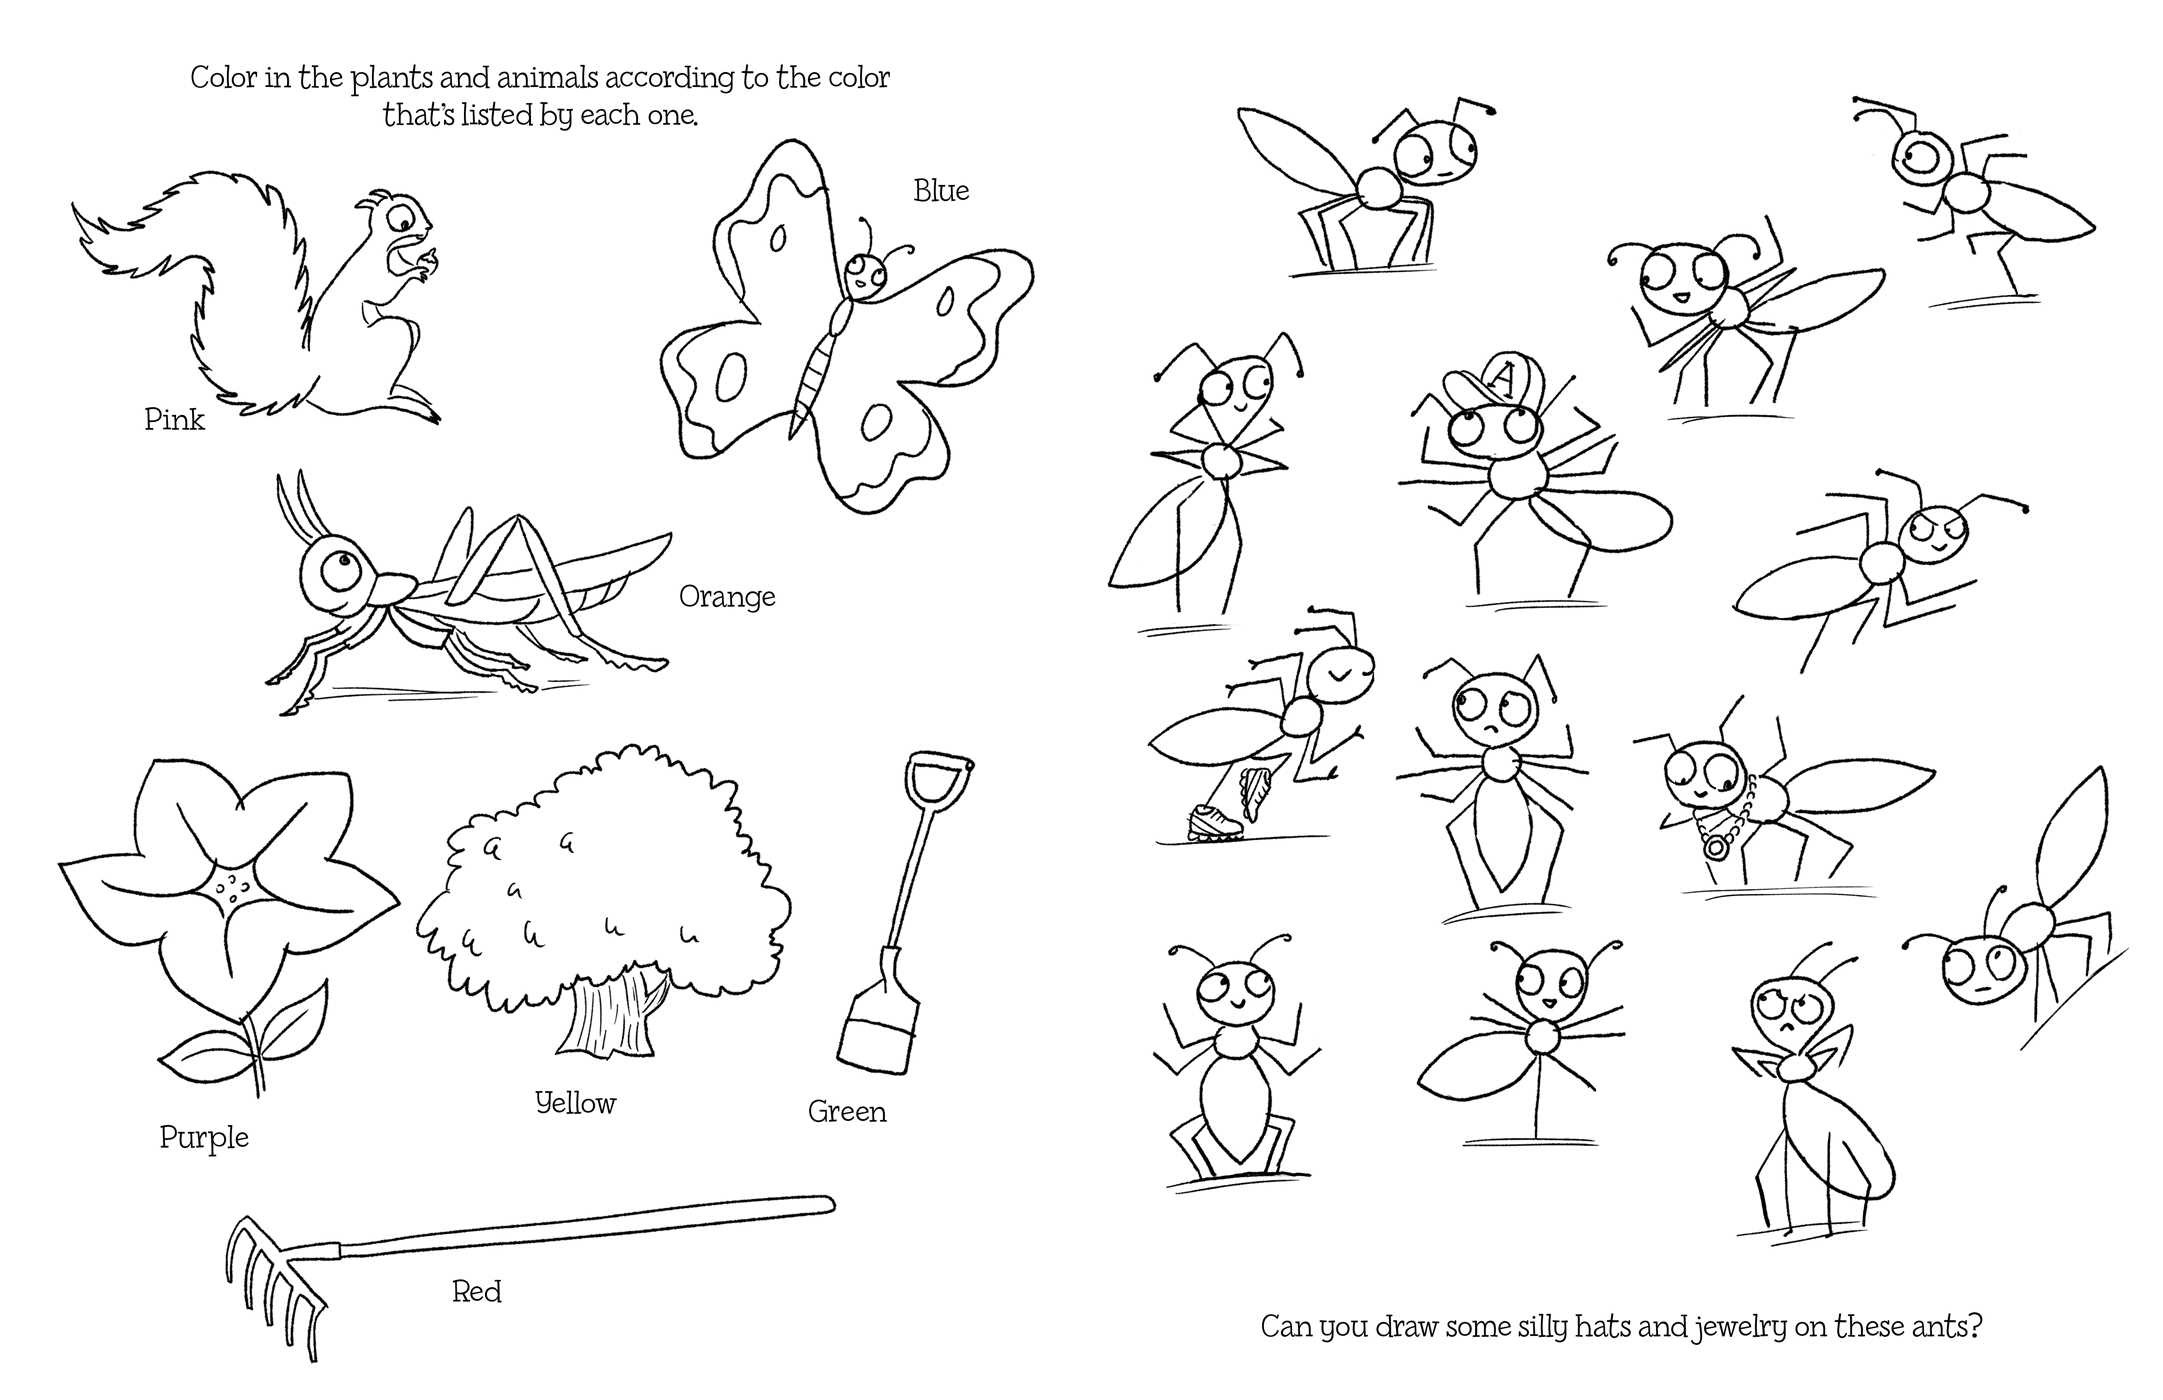 Dream doodle draw make believe magic 9781481462914.in08